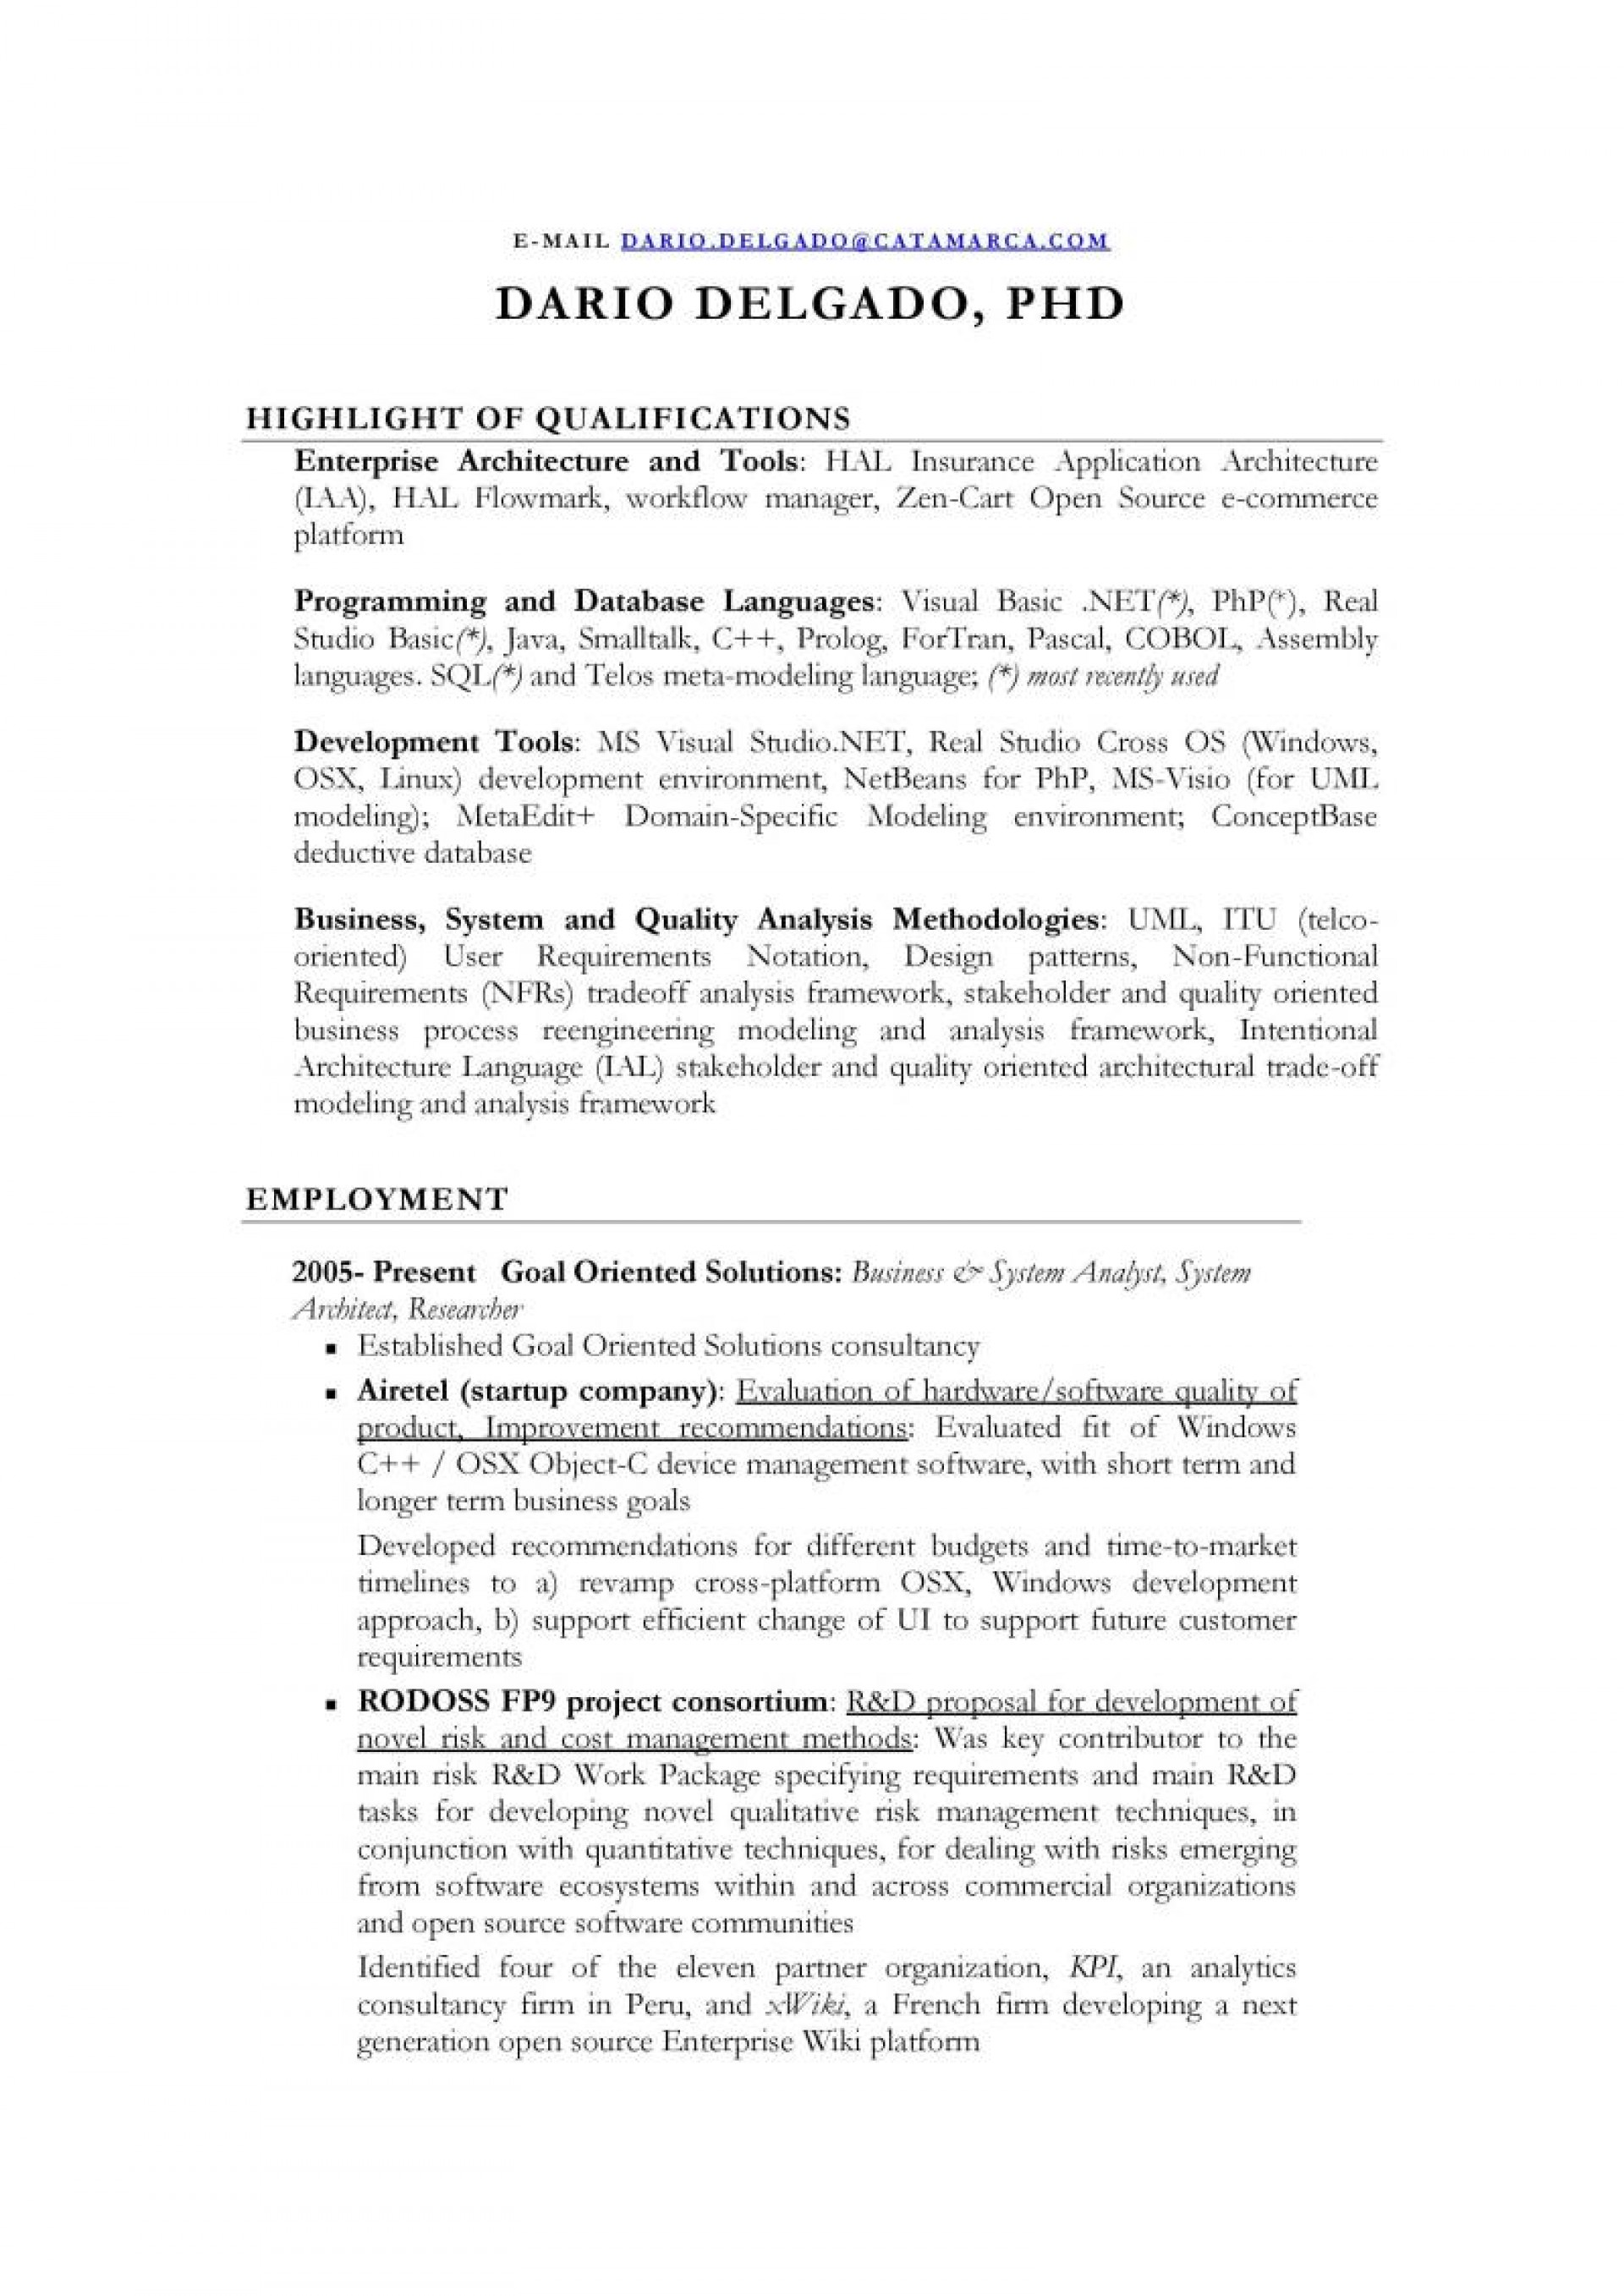 007 Sample Resume Net Developer Unique Essays Apply Texas Professional School Essay Example Of Developerresize8002c1131ssl1 Unusual Examples Topic A C 2017 1920